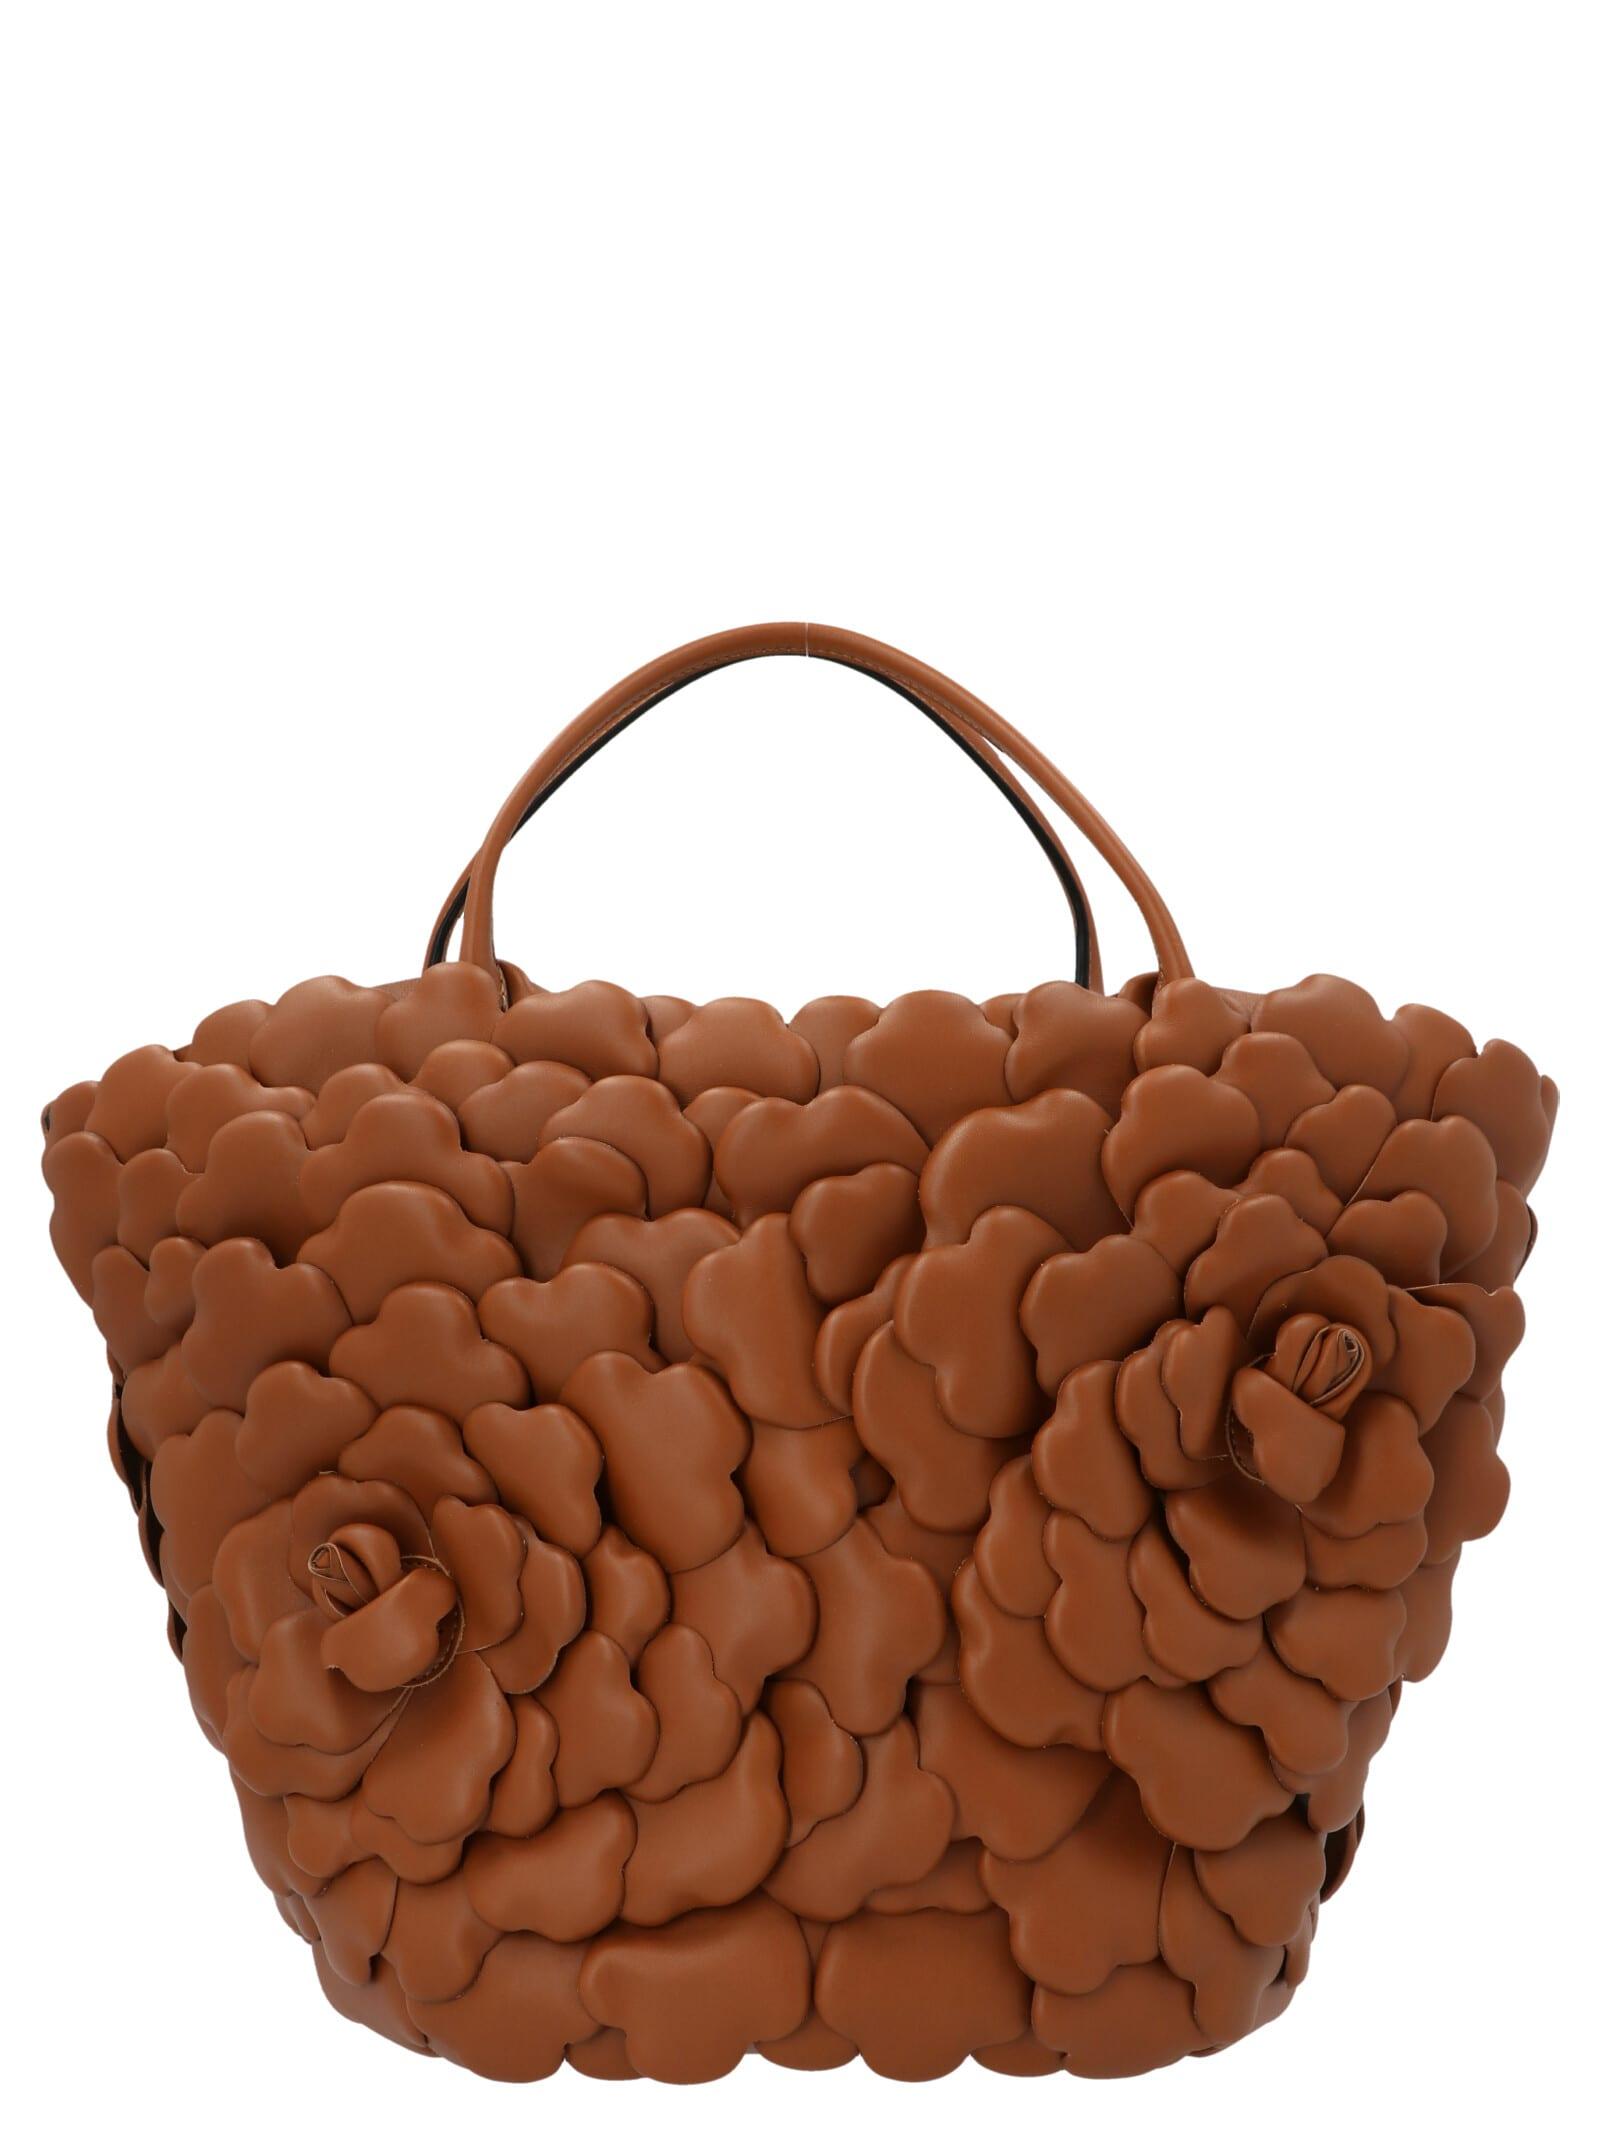 Valentino Garavani atelier Bag Rose Edition Bag